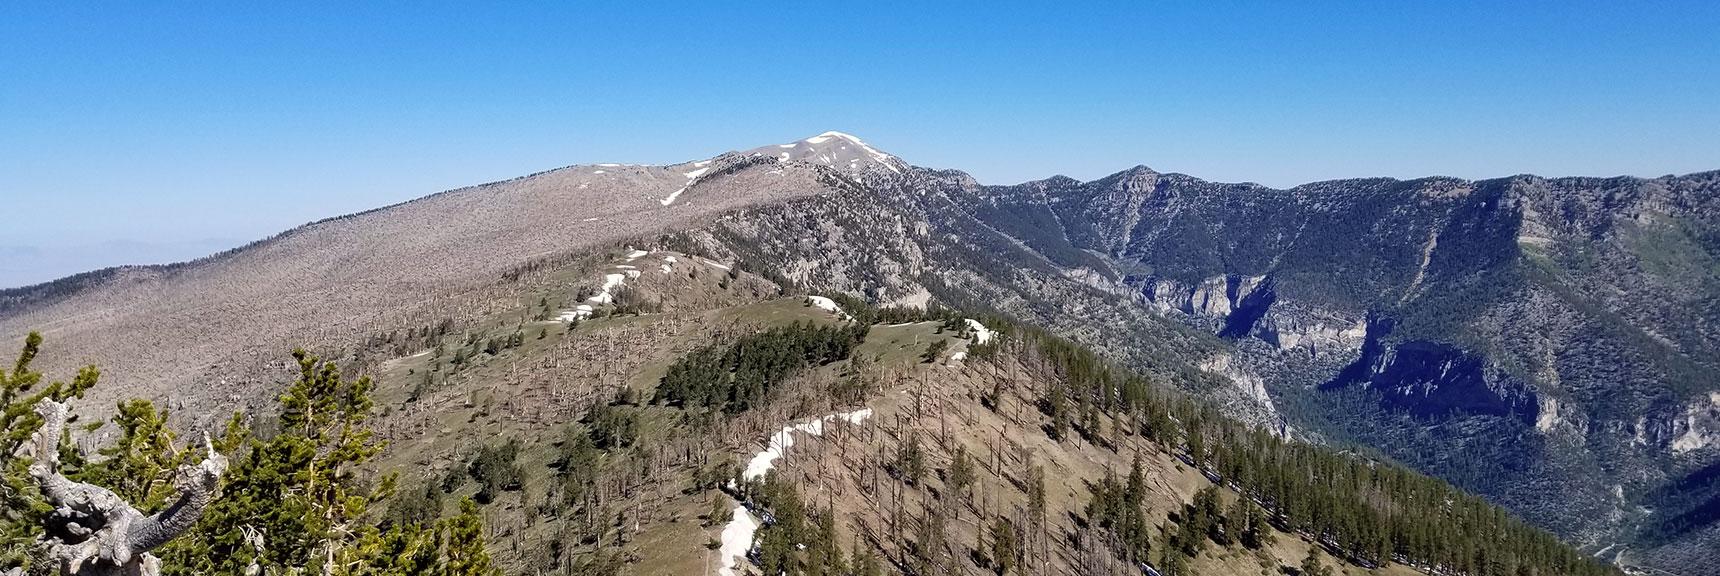 View Toward Mt. Charleston from Griffith Peak Summit, Nevada